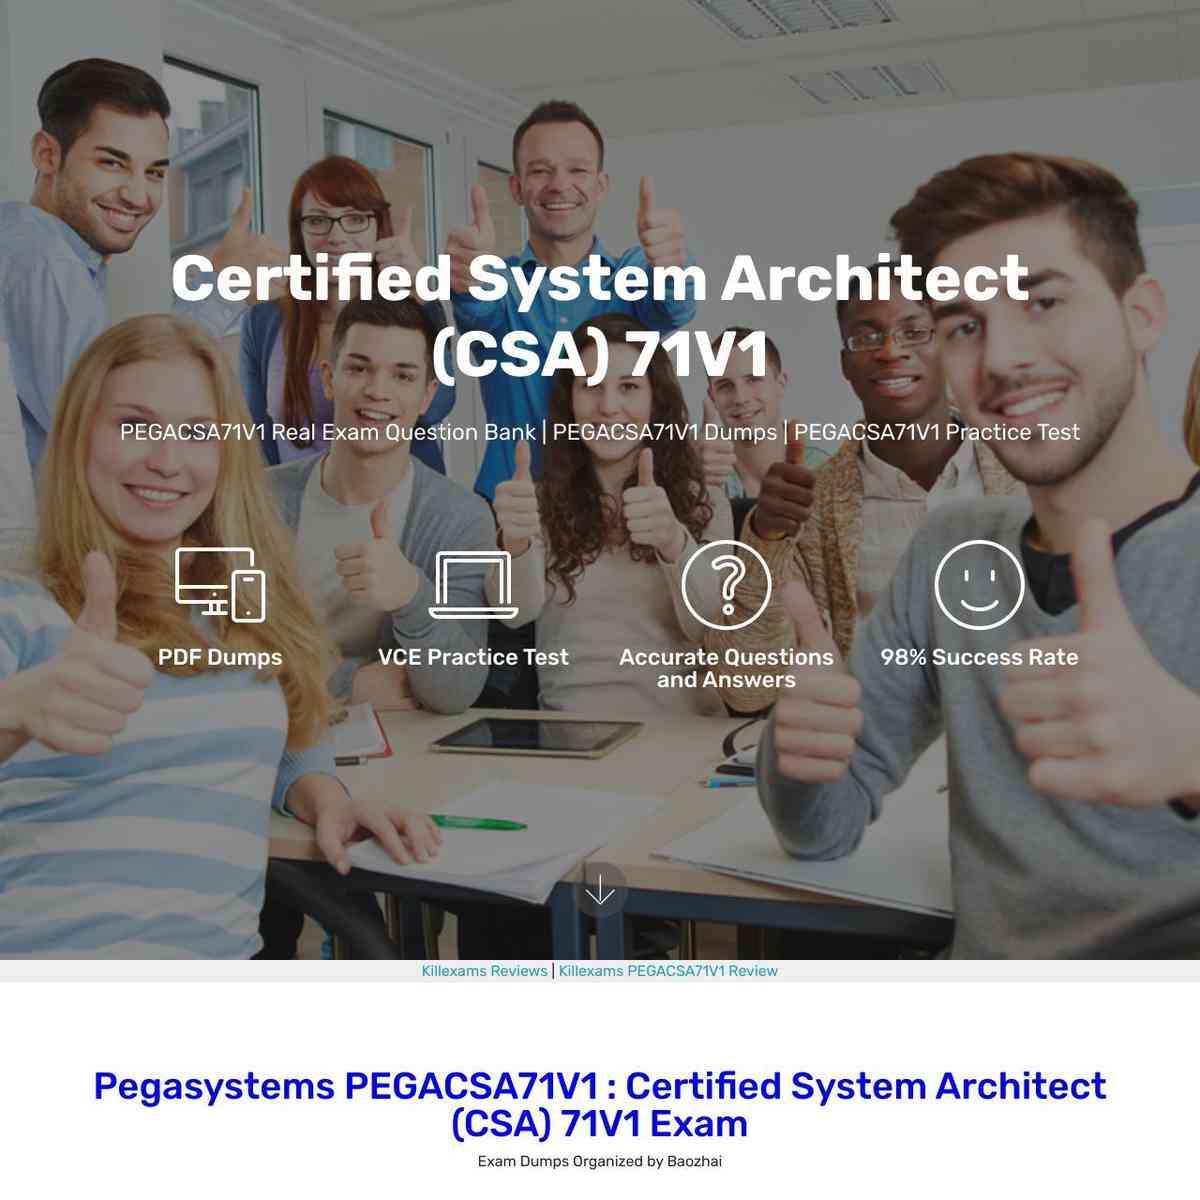 PEGACSA71V1 Cheatsheet are totally changed by Pegasystems